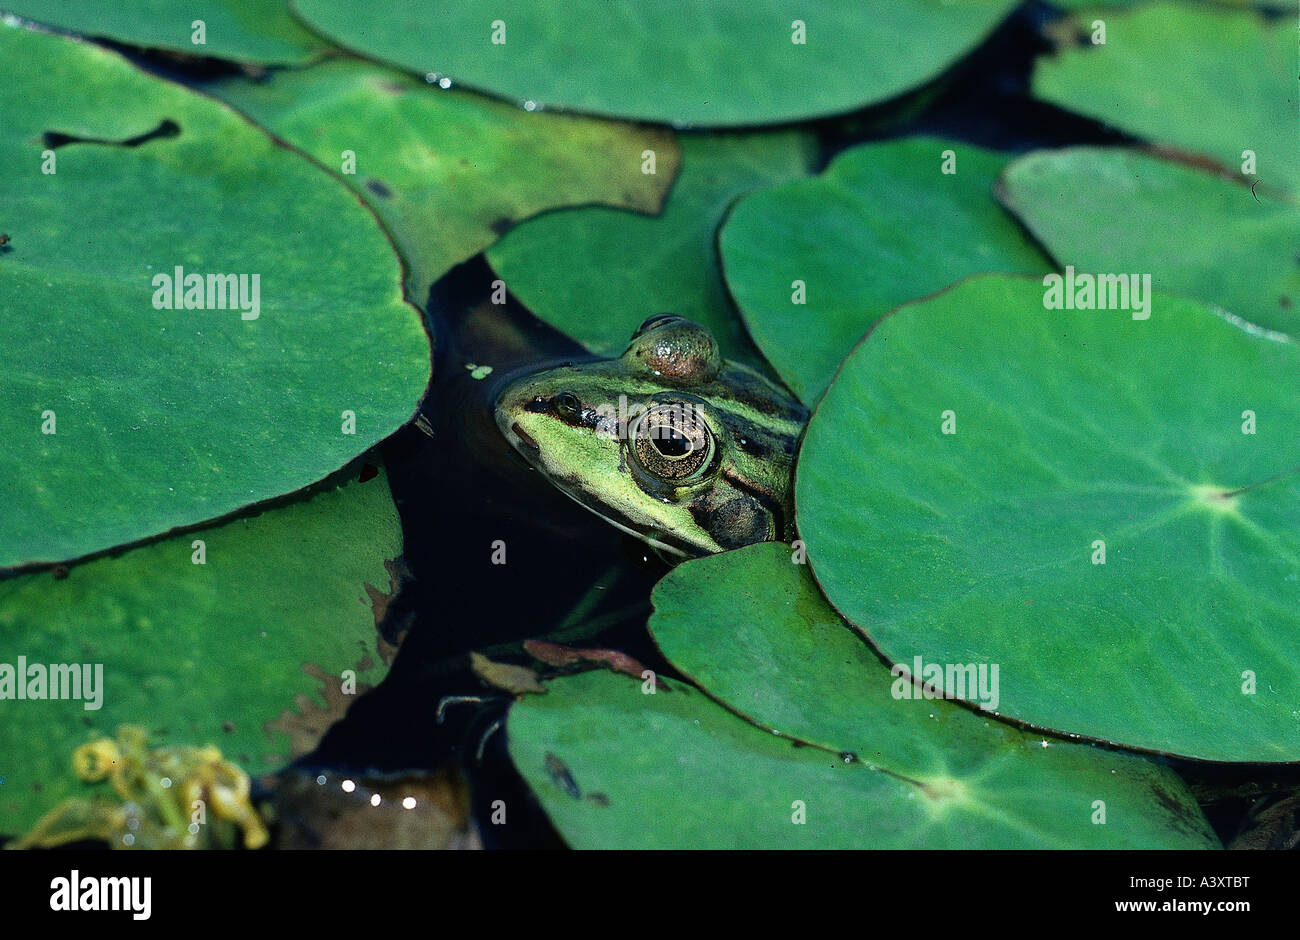 Zoology Animals Amphibian Frogs Pool Frog Rana